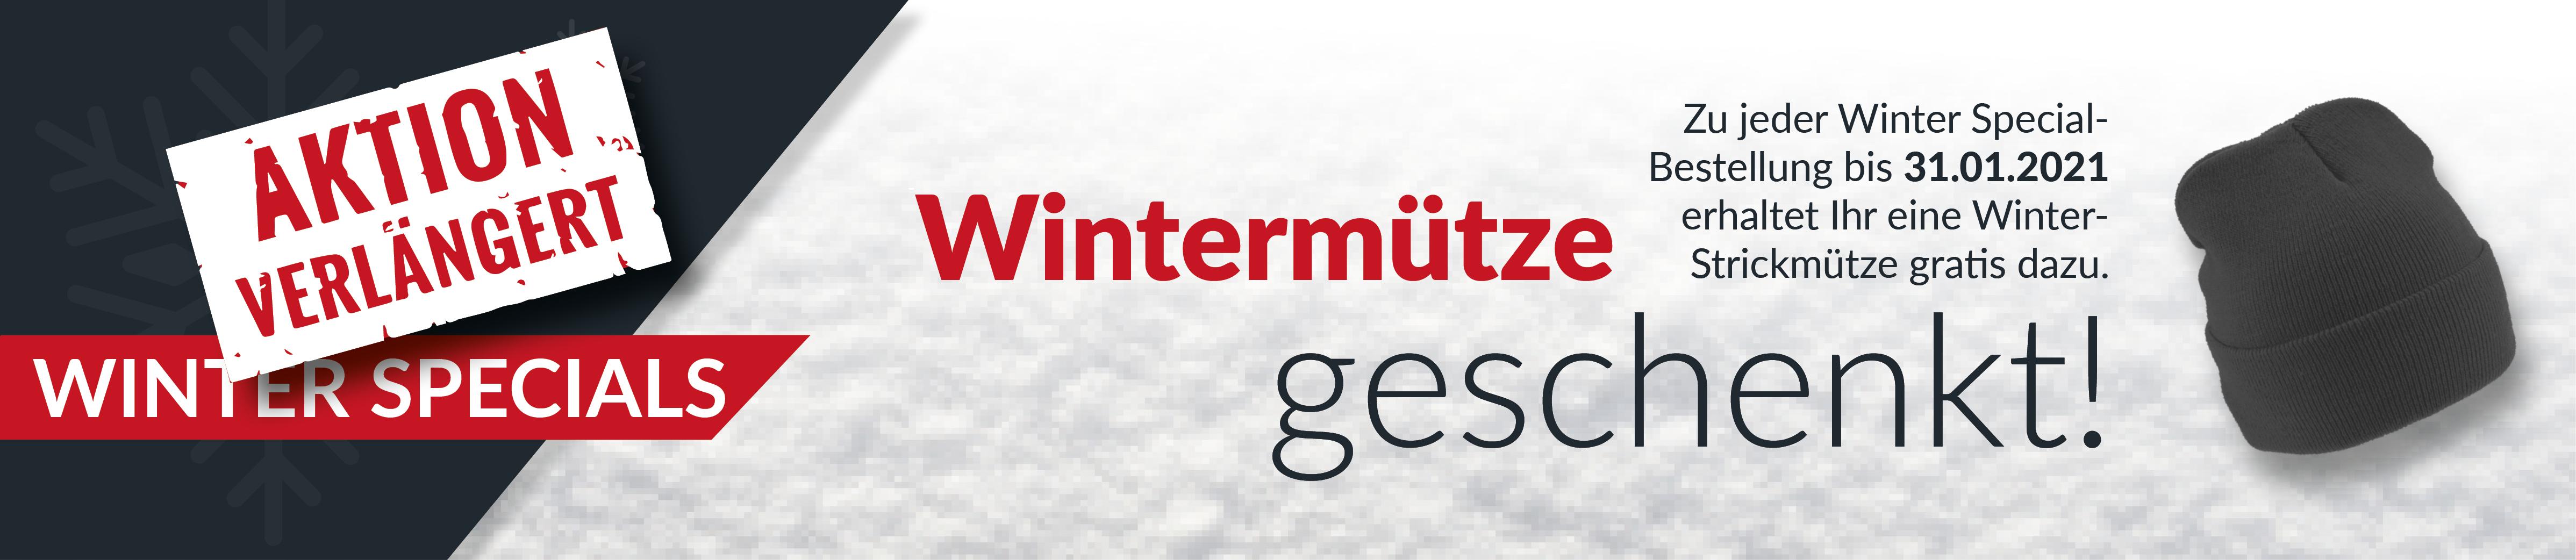 Banner-Winterspecial_Kategorie